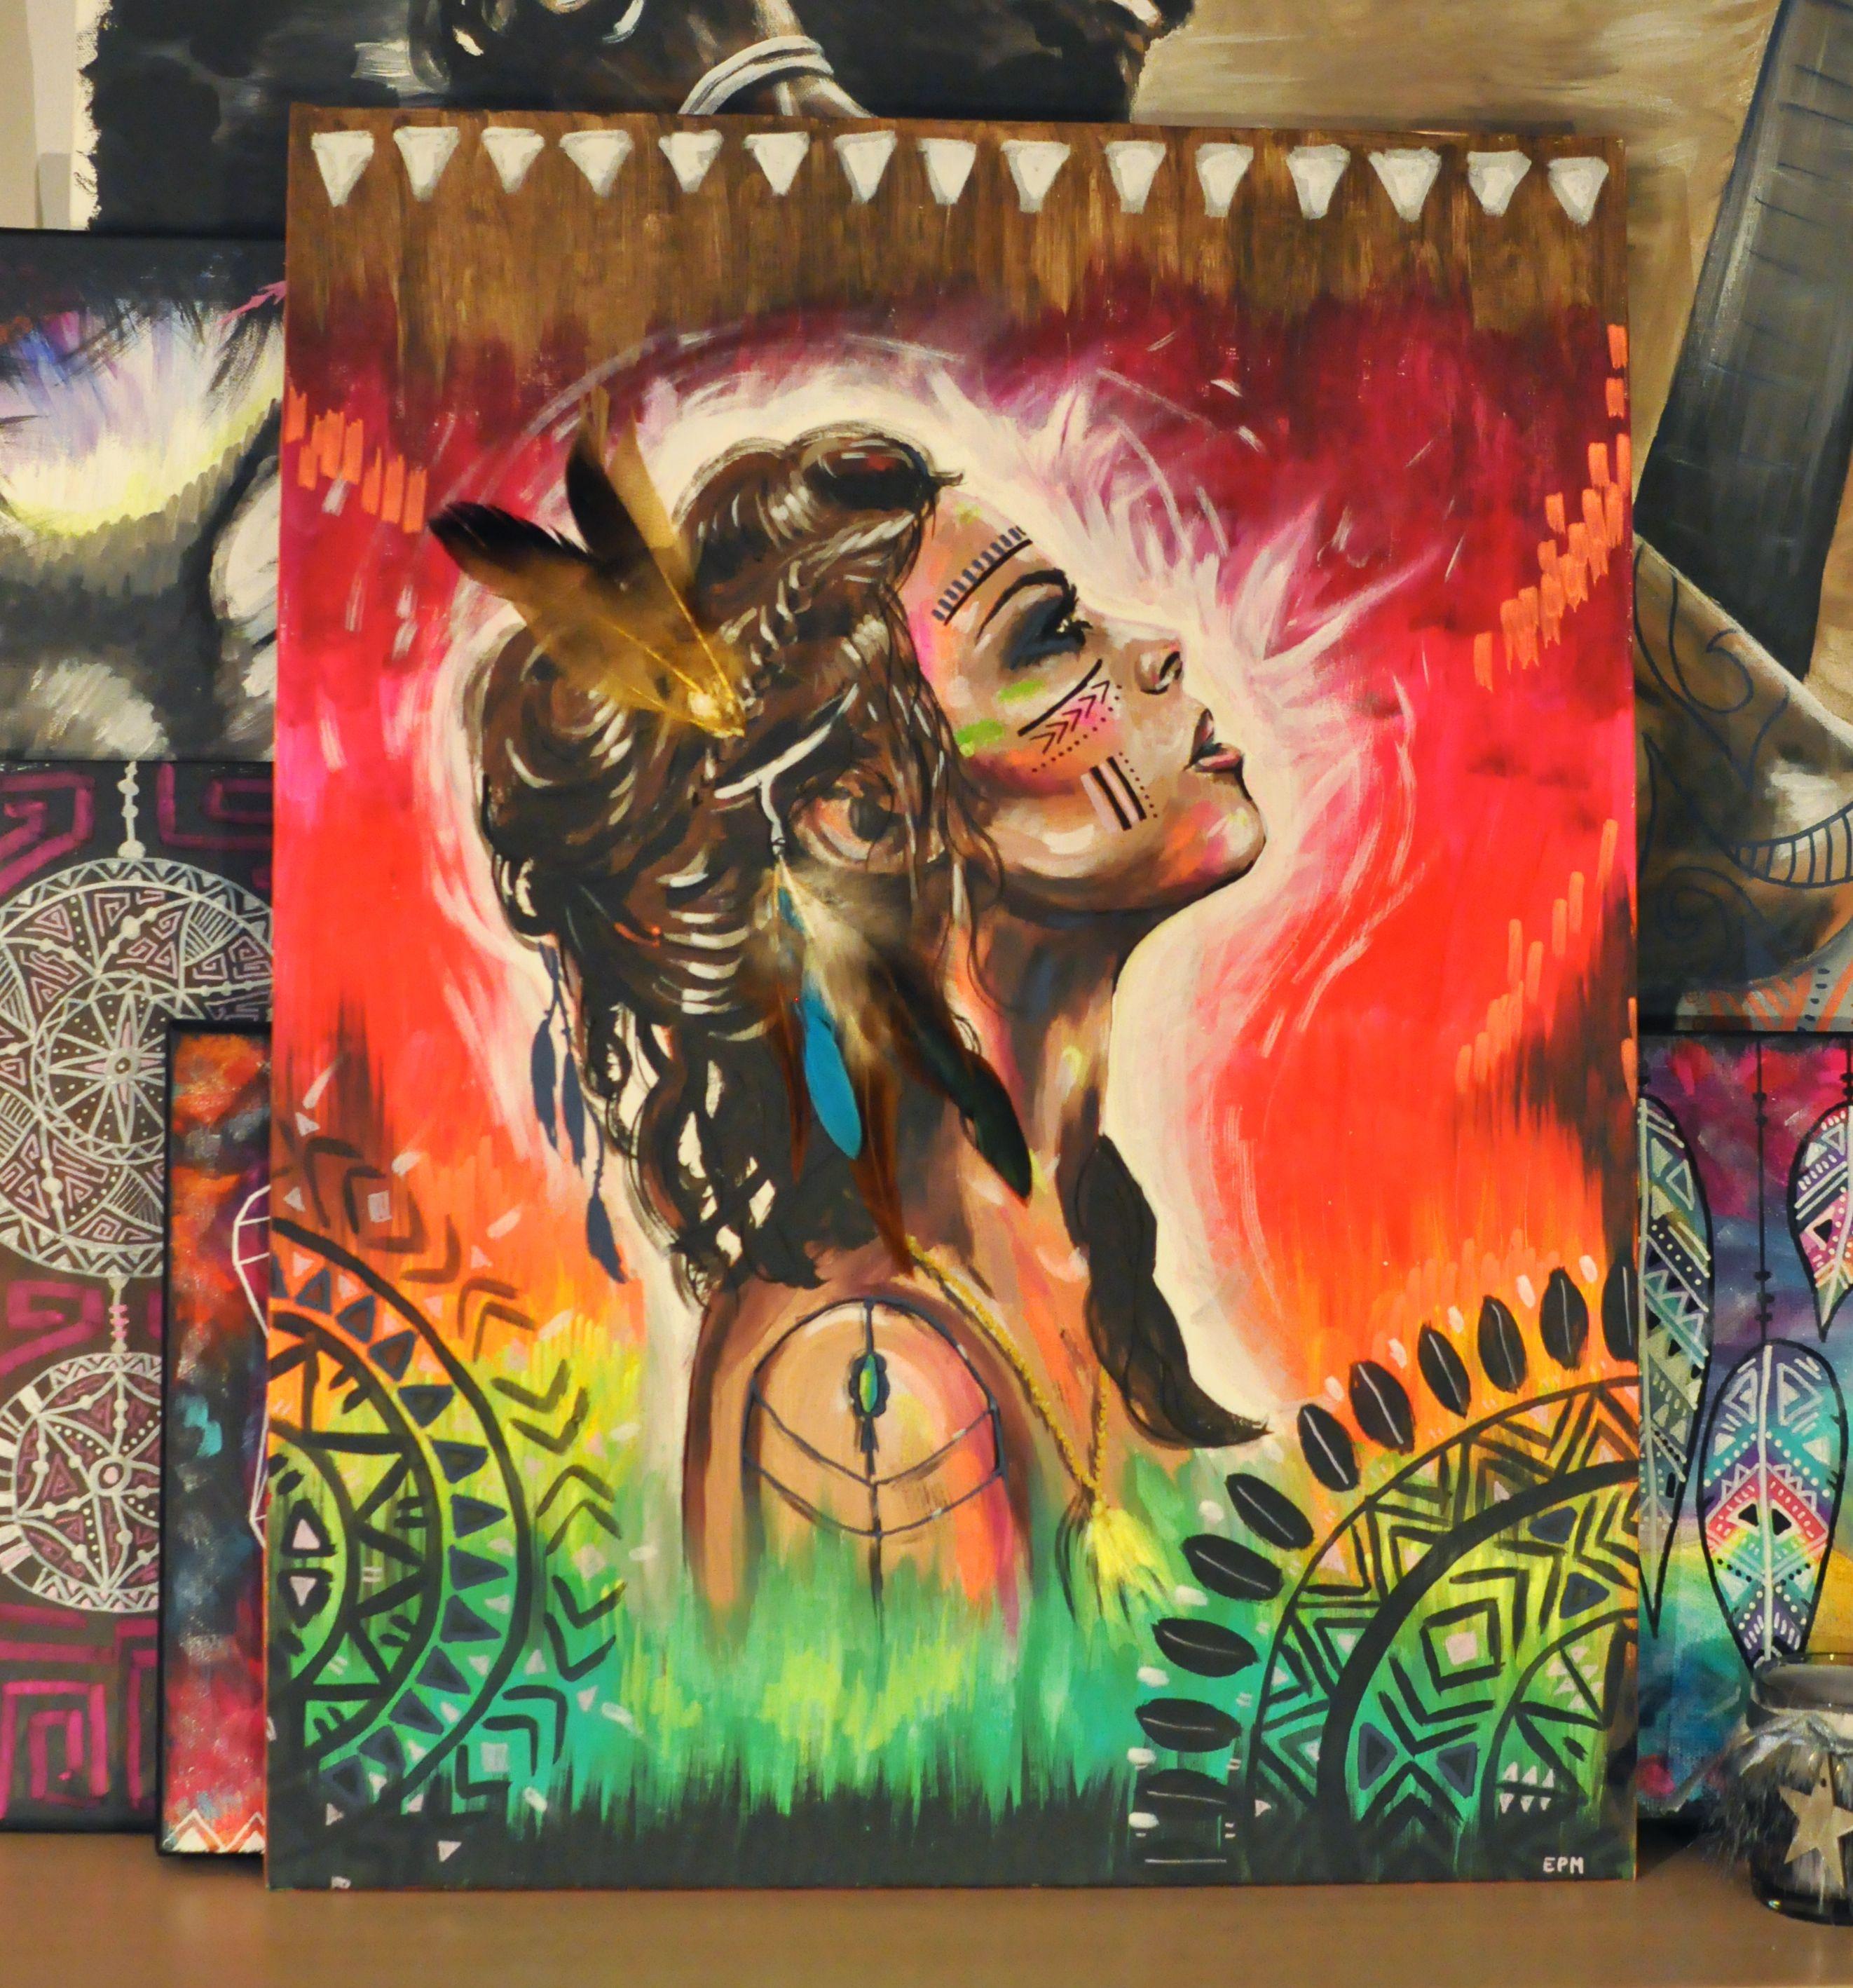 Eva Lubart - portrait indienne bohème gipsy http://www.alittlemarket.com/peintures/eva_lubart_portrait_indienne_gipsy_bohemienne_vraies_plumes-12750261.html